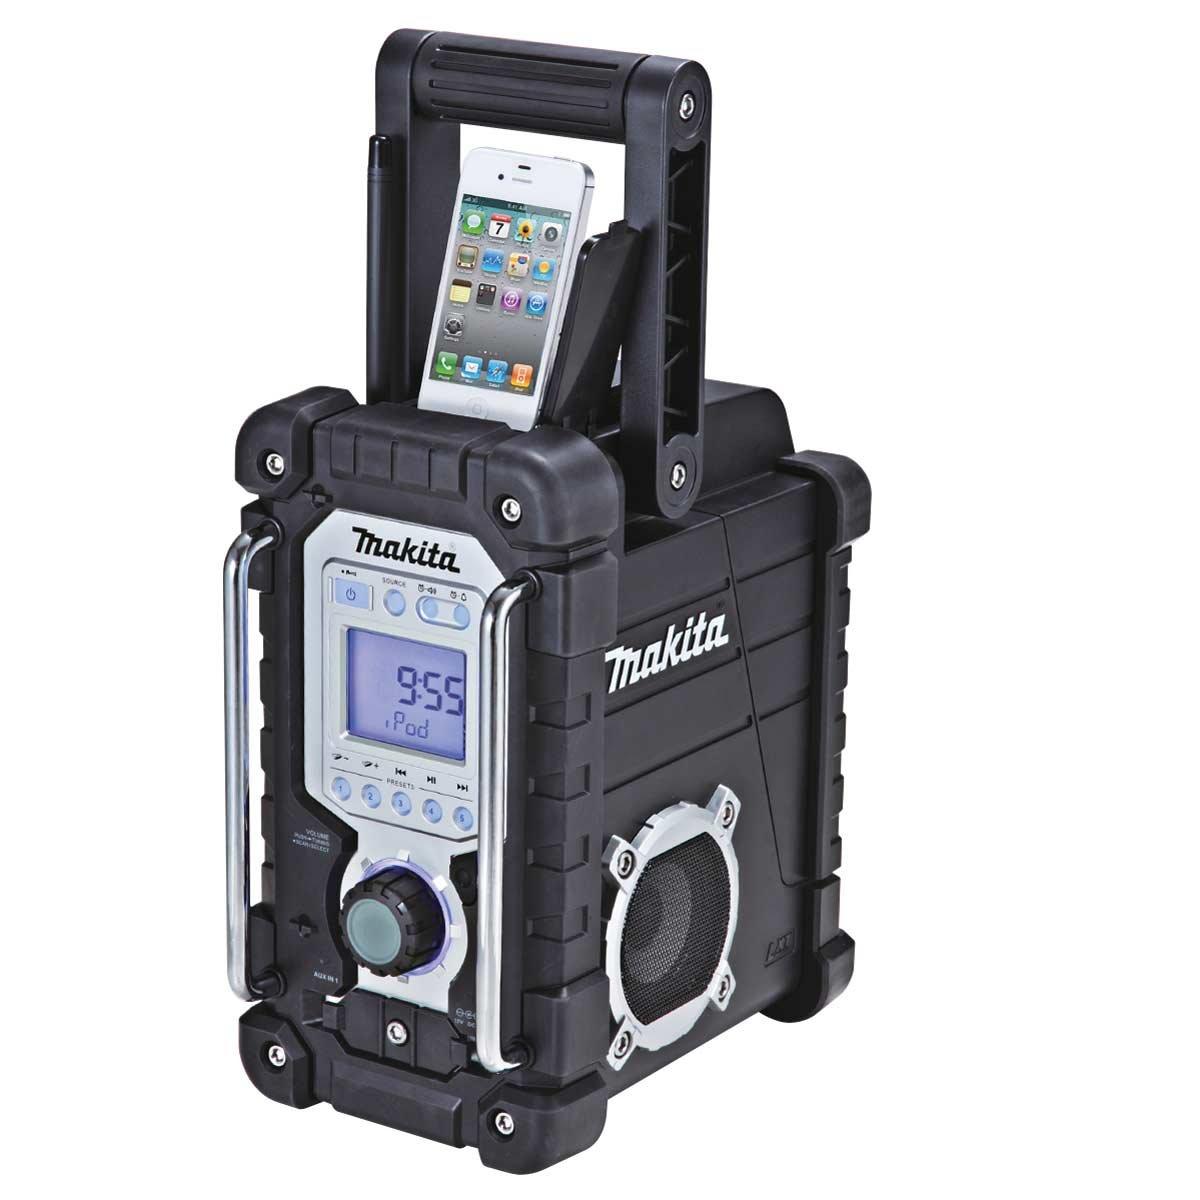 Makita Radio de chantier 7,2 à 18 V Li-Ion, Ni-Mh (Machine seule) - Radios portables (Ni-Mh (Machine seule), Portable, AM,FM, 87,5-108 MHz, 522-1629 kHz, Auto scan, 7 W) 2 à 18 V Li-Ion DMR103B